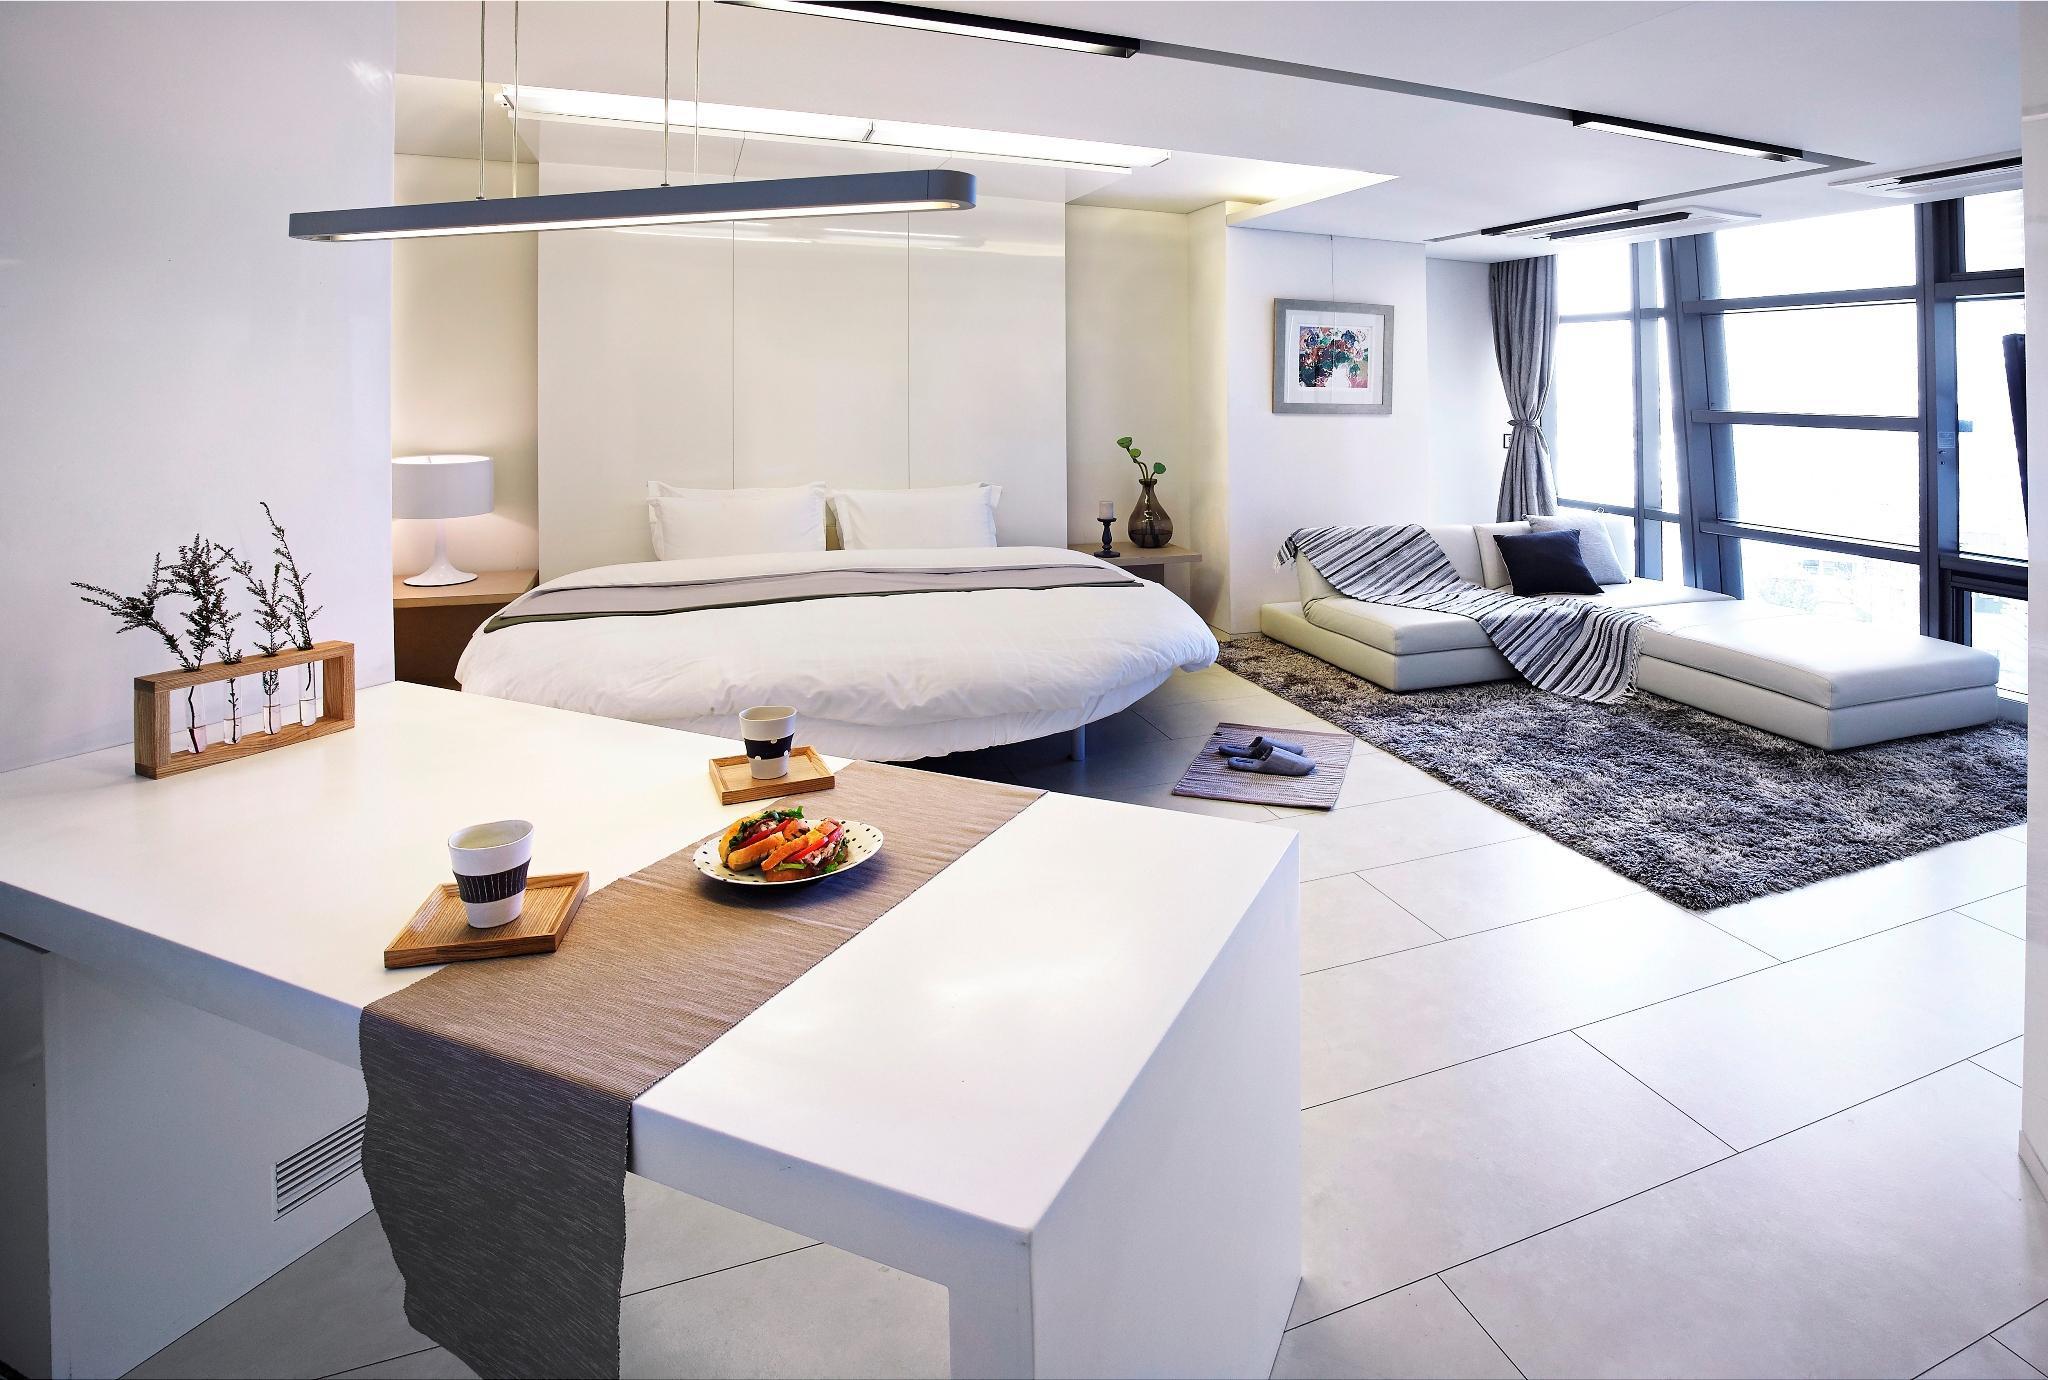 The Classic 500 Executive Residence Pentaz 2